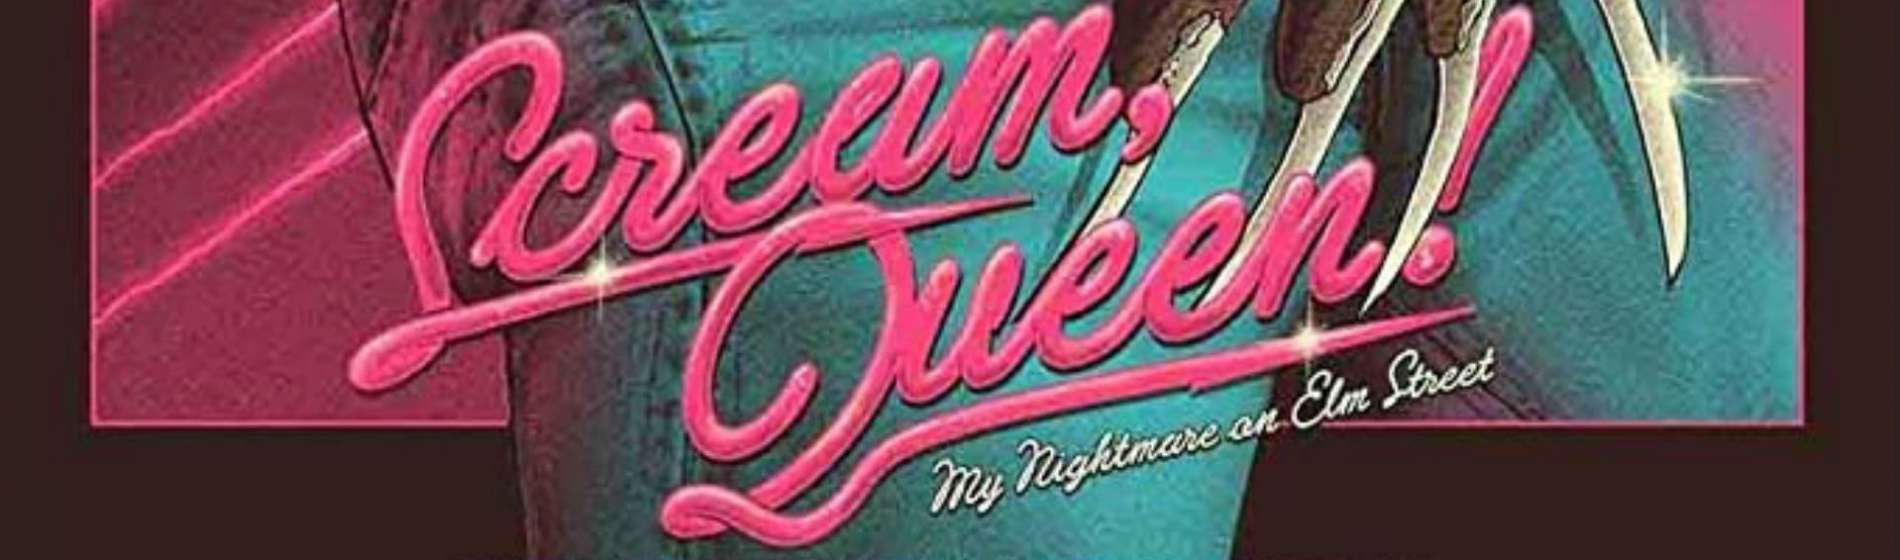 Shudder-scream-queen-image